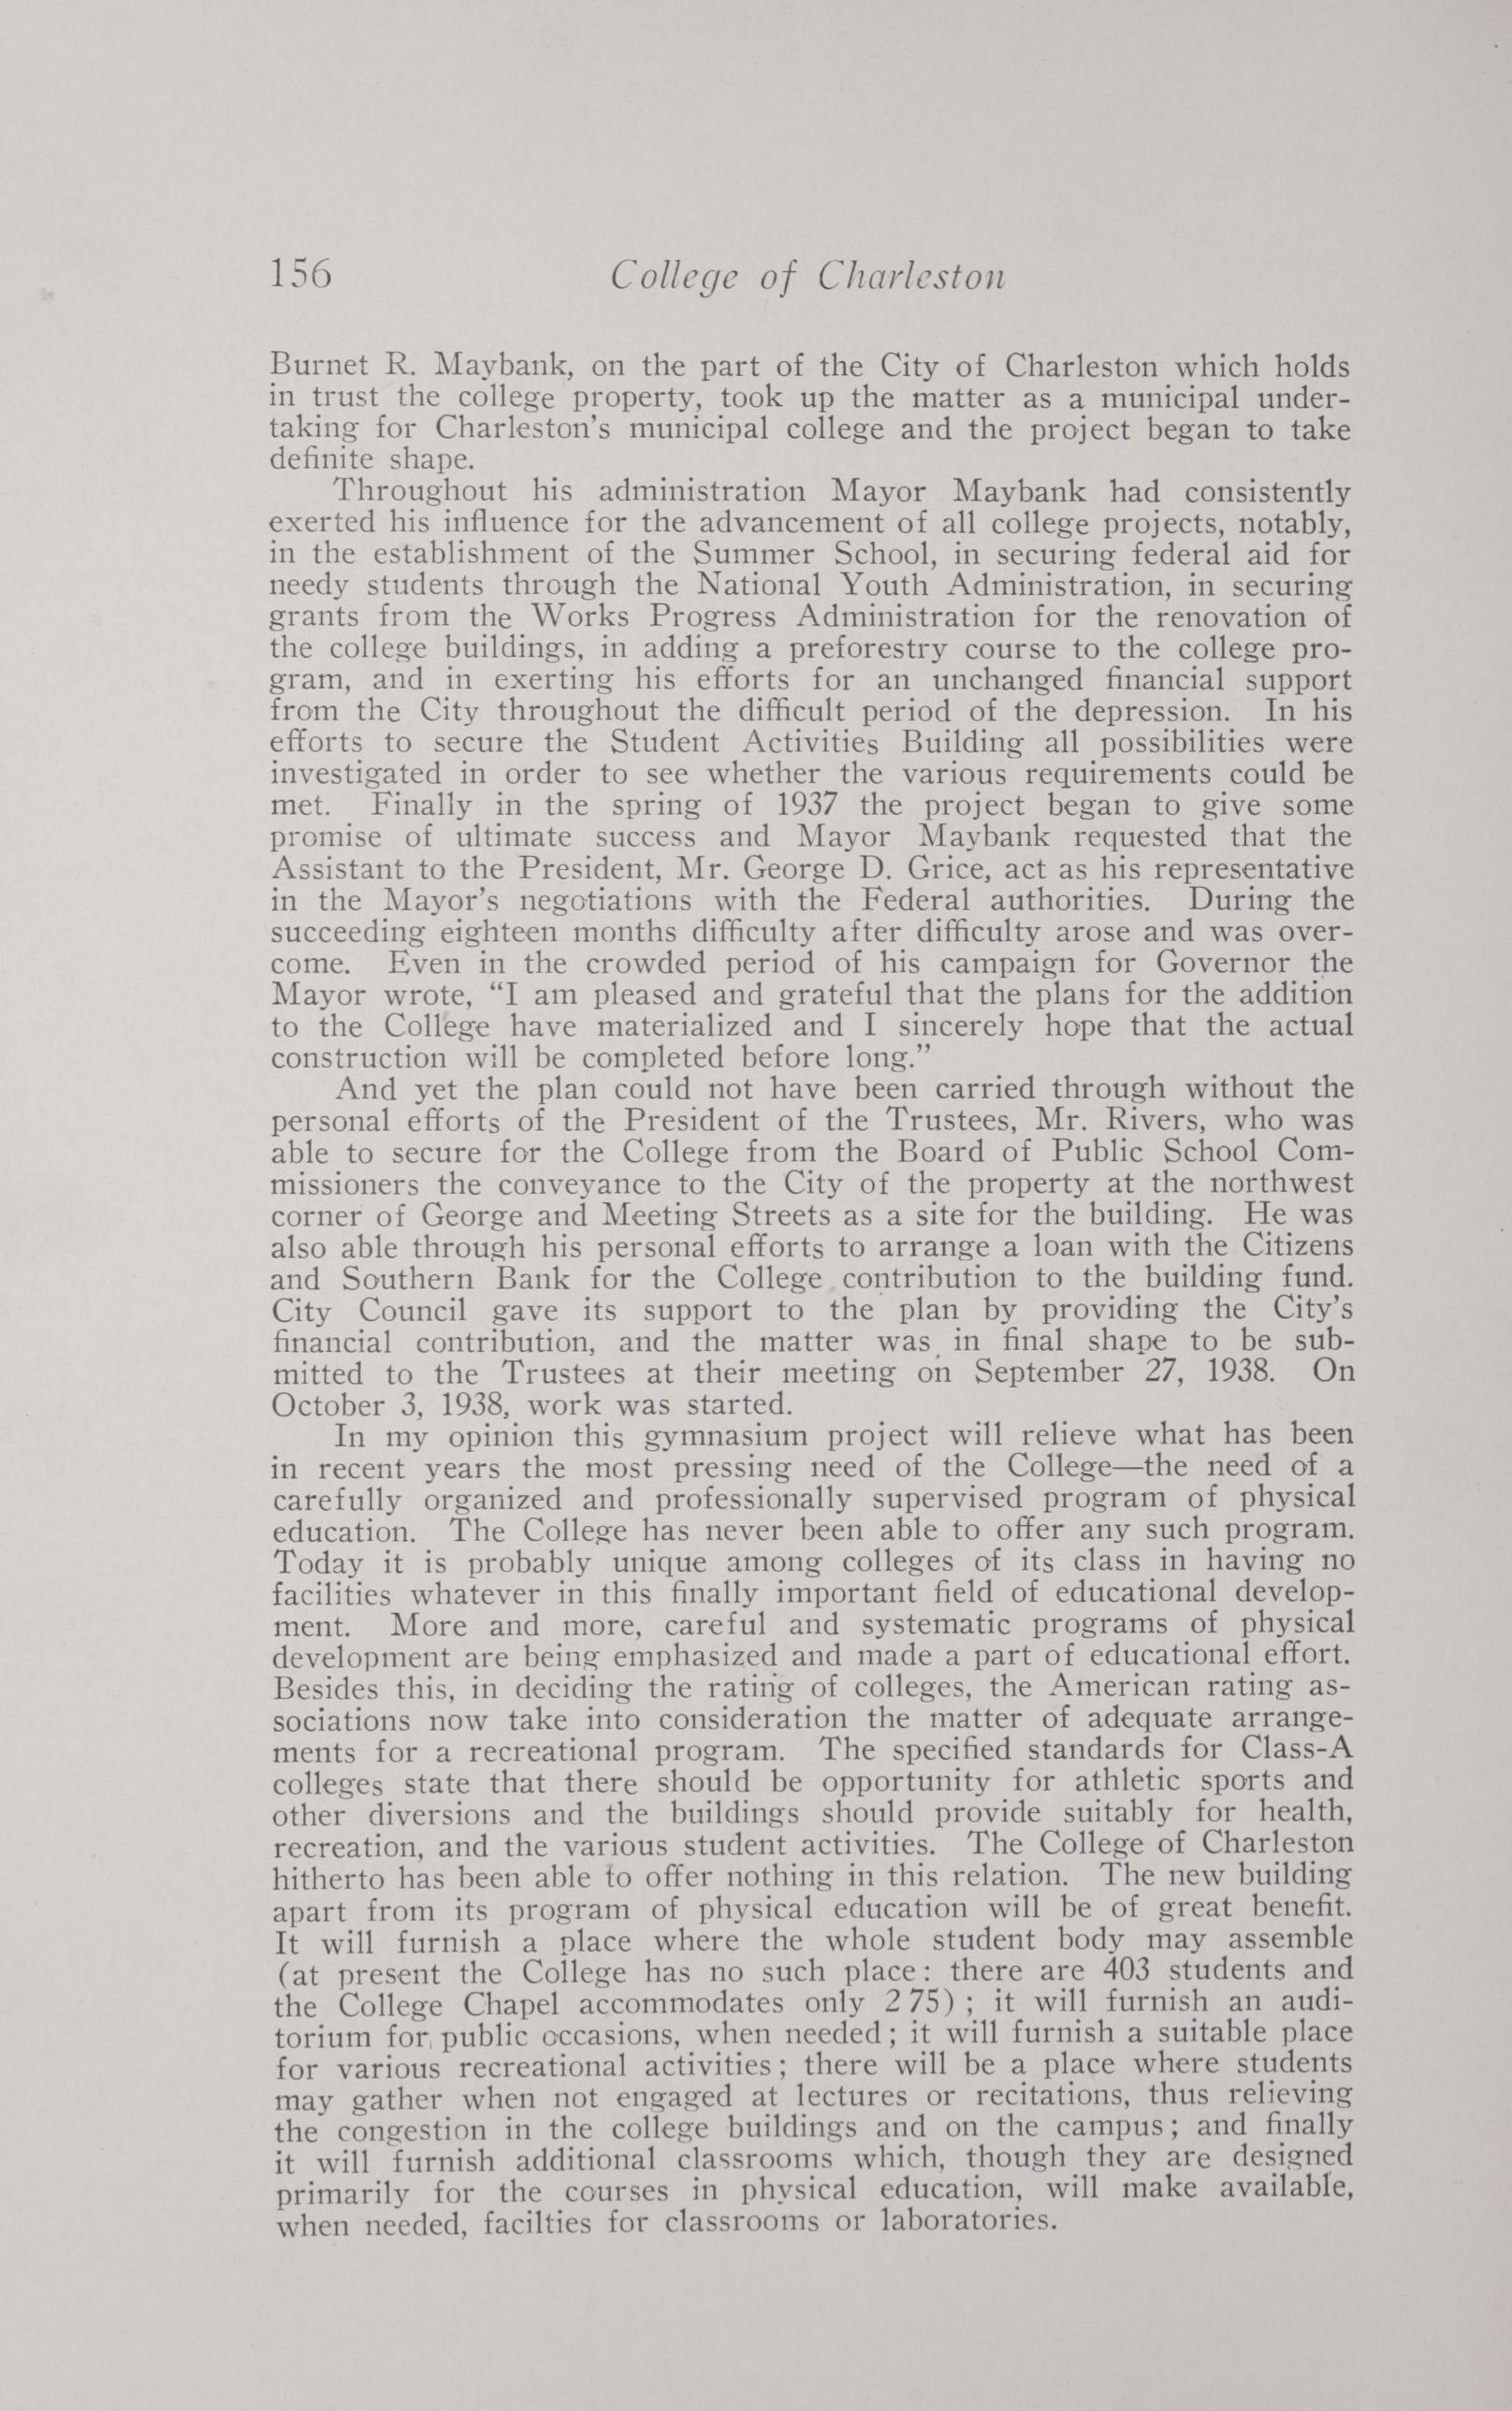 Charleston Yearbook, 1938, page 156